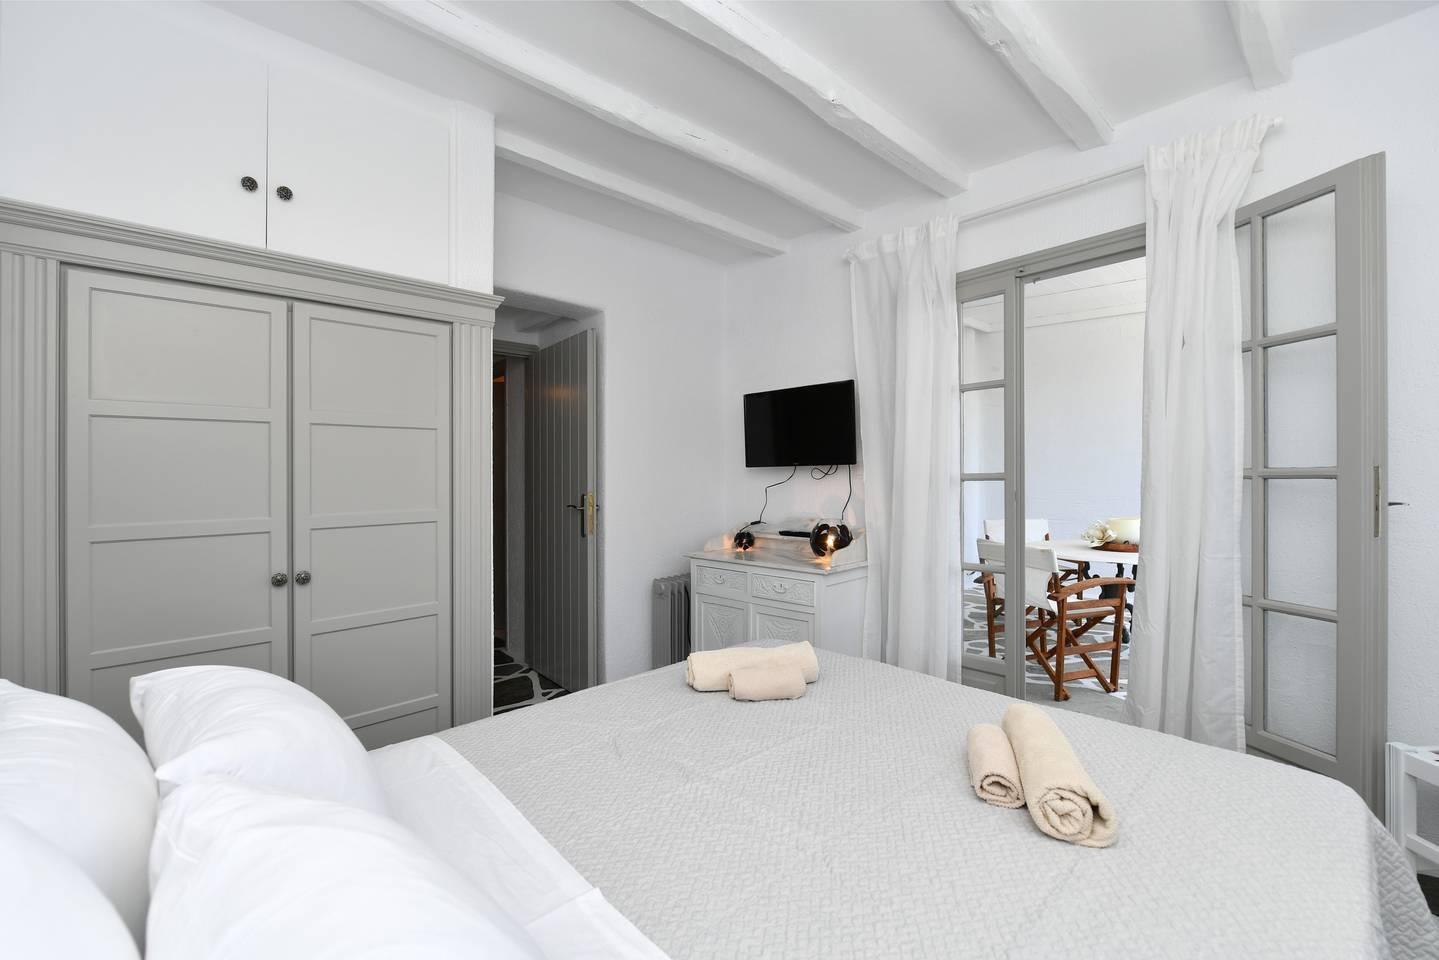 Apartment Santa Flora 3 Bedroom House - Parikia s Edge photo 18958999